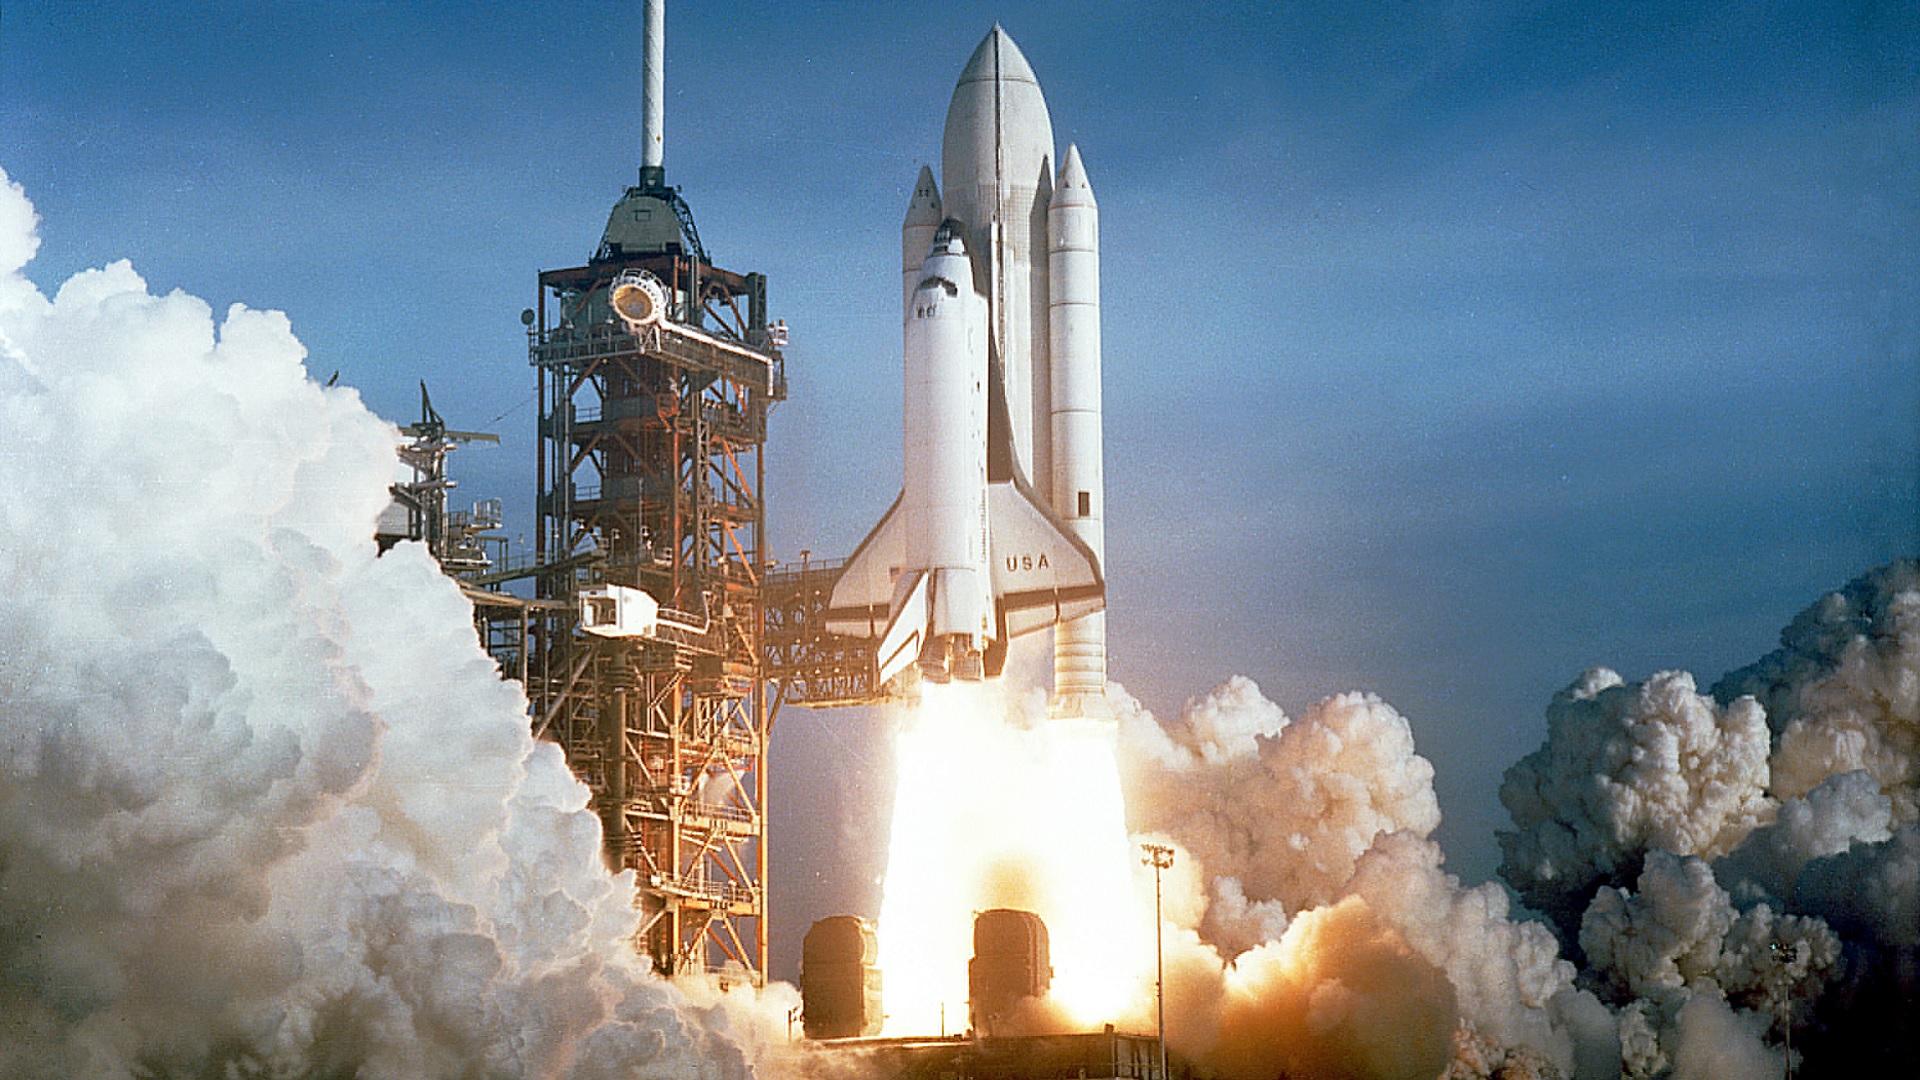 nasa shuttle development triumph and tragedy - HD1920×1080